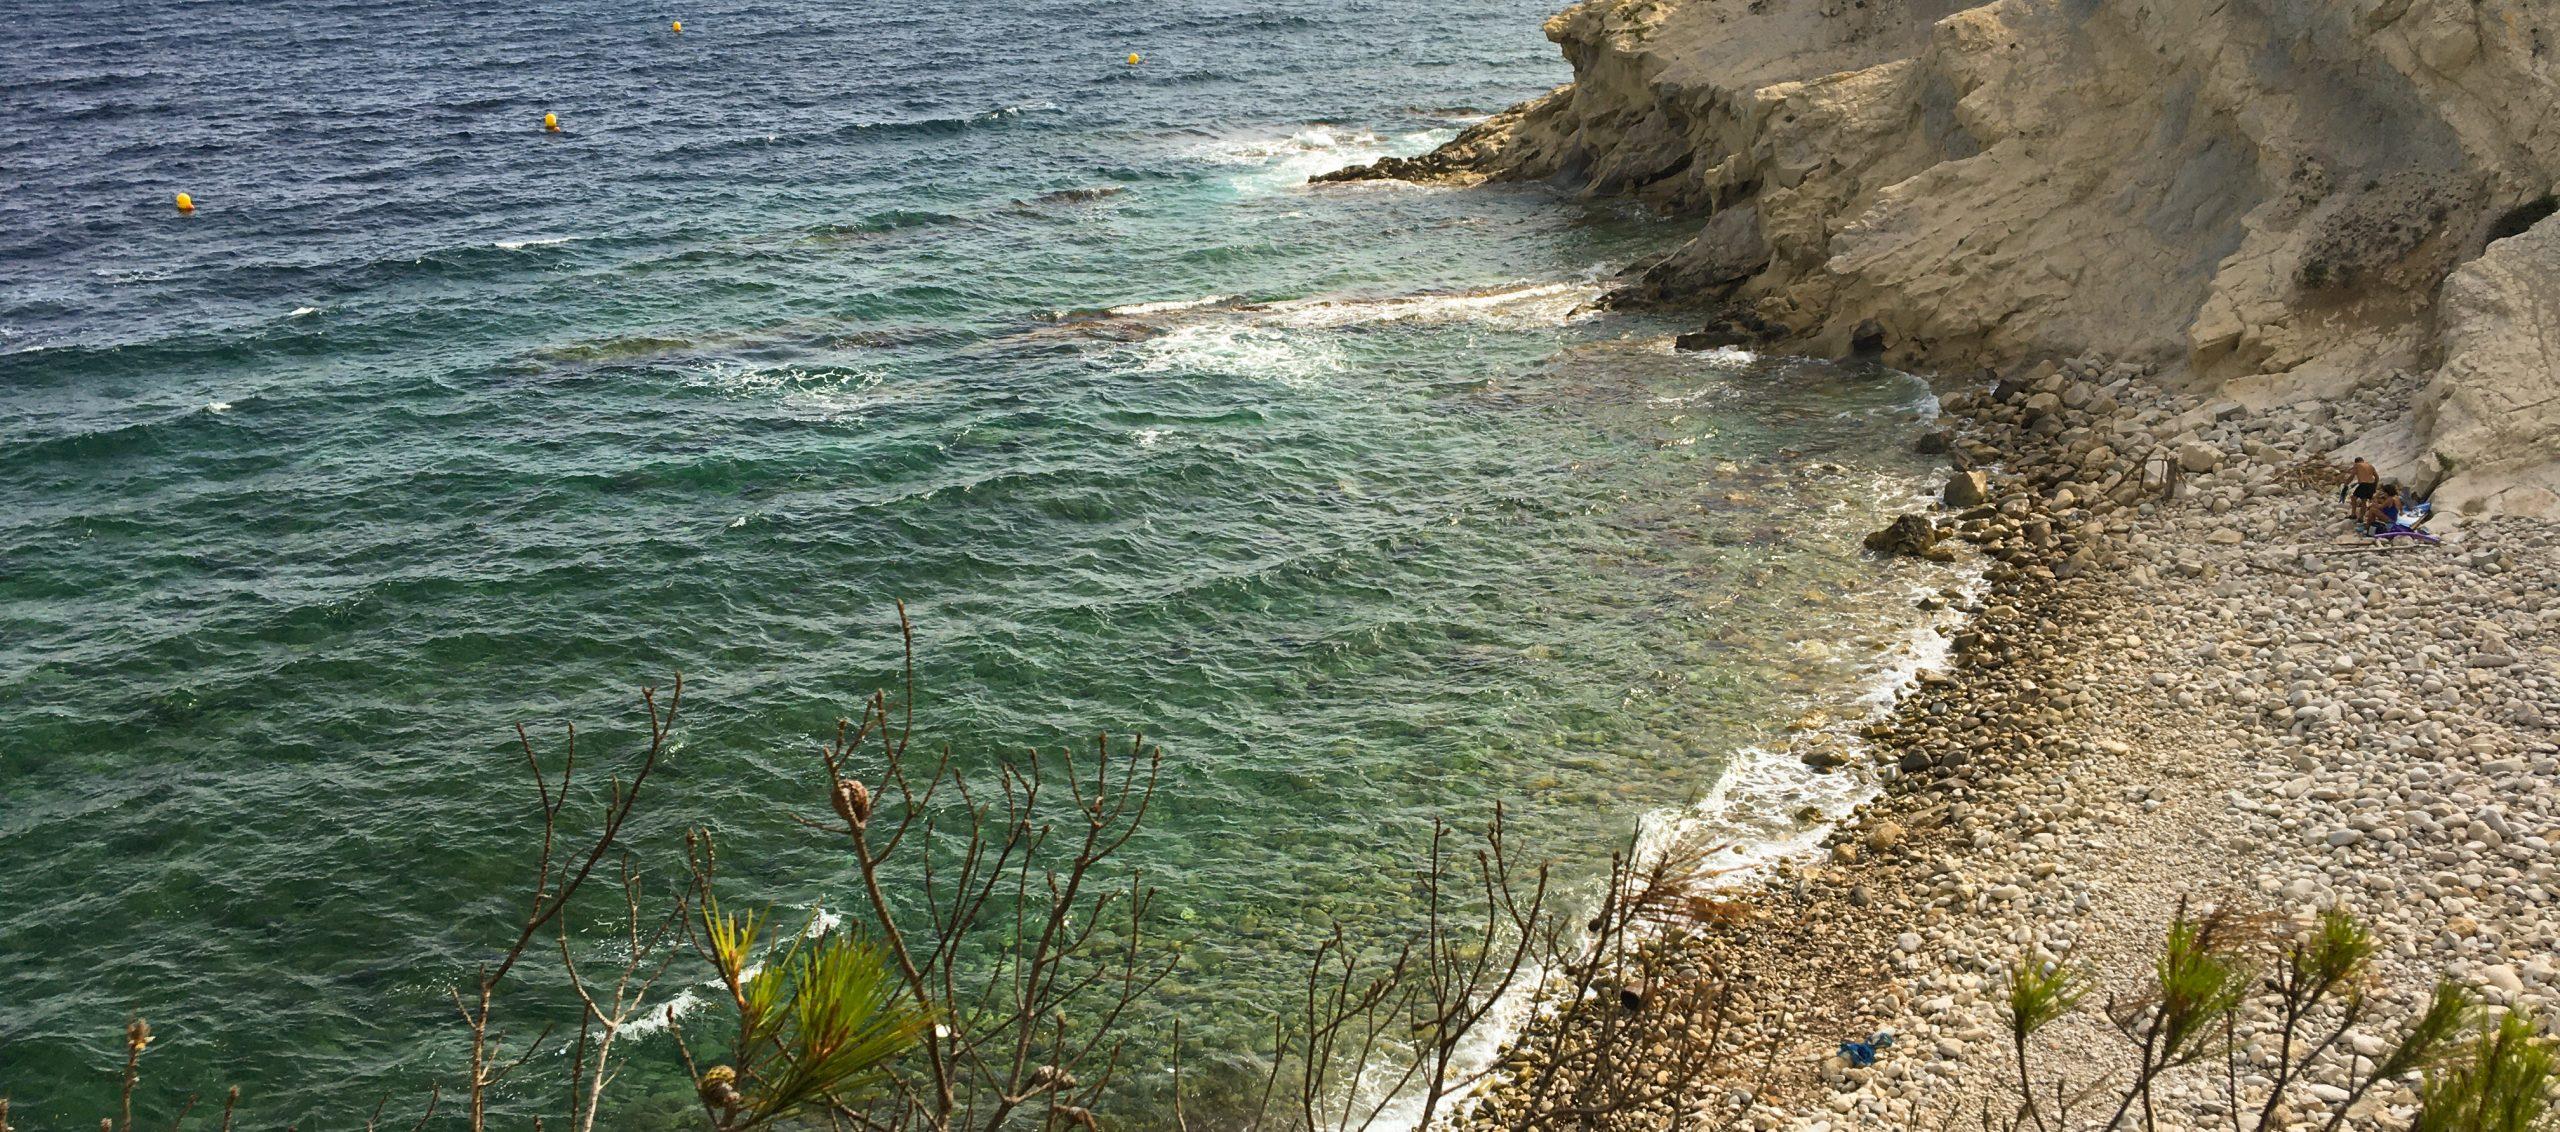 Xabia, España: Volviendo a la libertad de viajar!